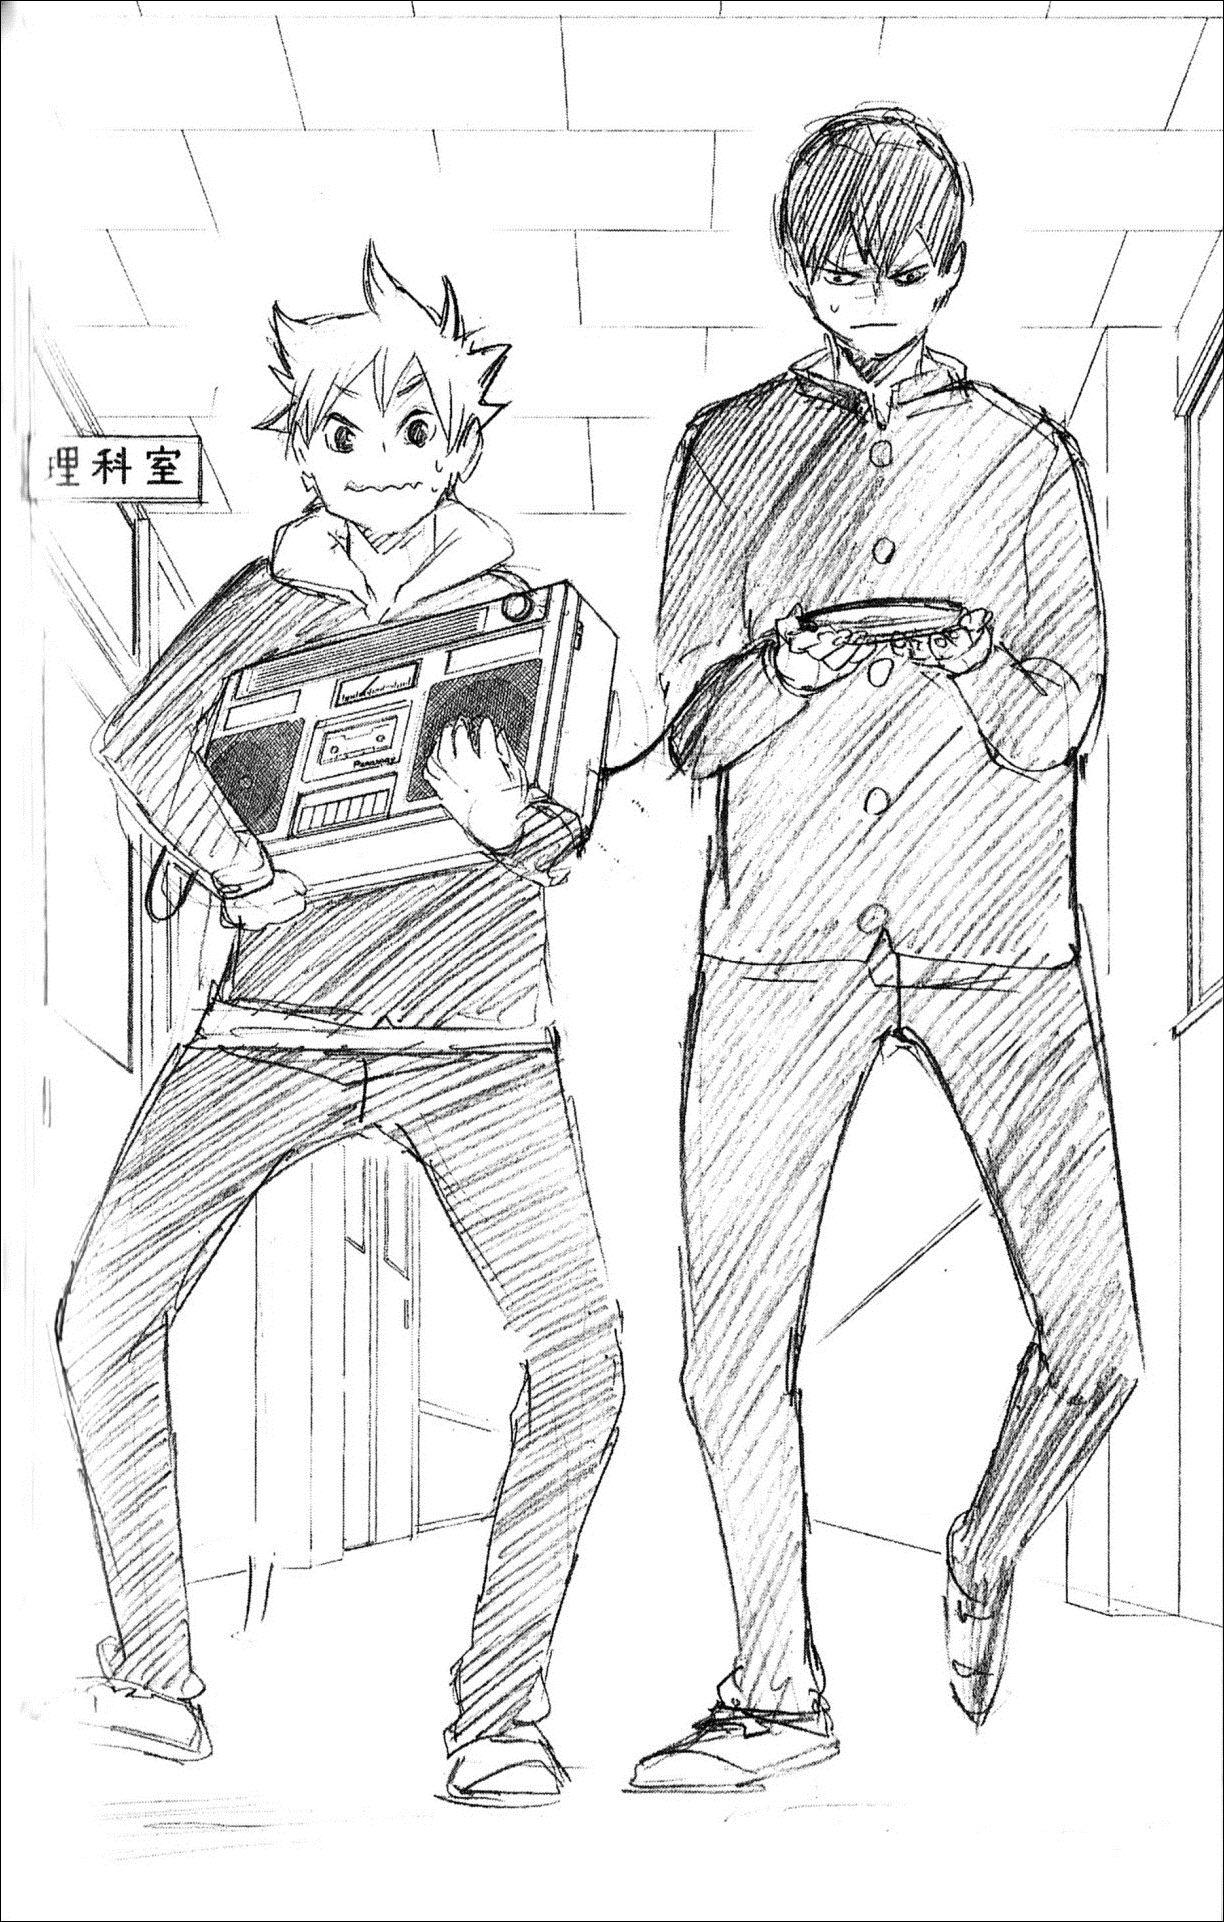 Haikyuu!! - Kageyama and Shouyou